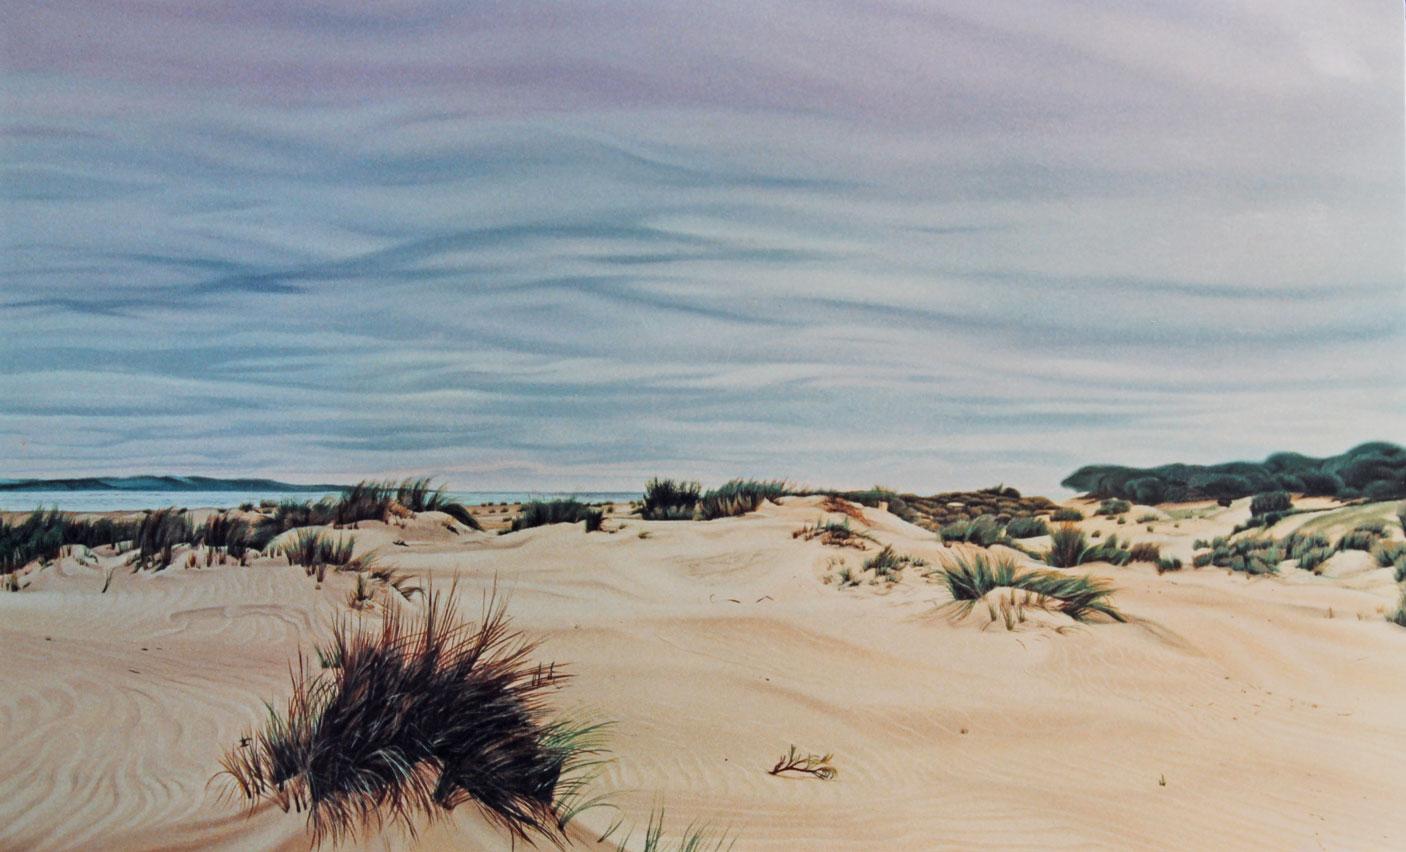 Winter Sand Dunes in Coto Doñana